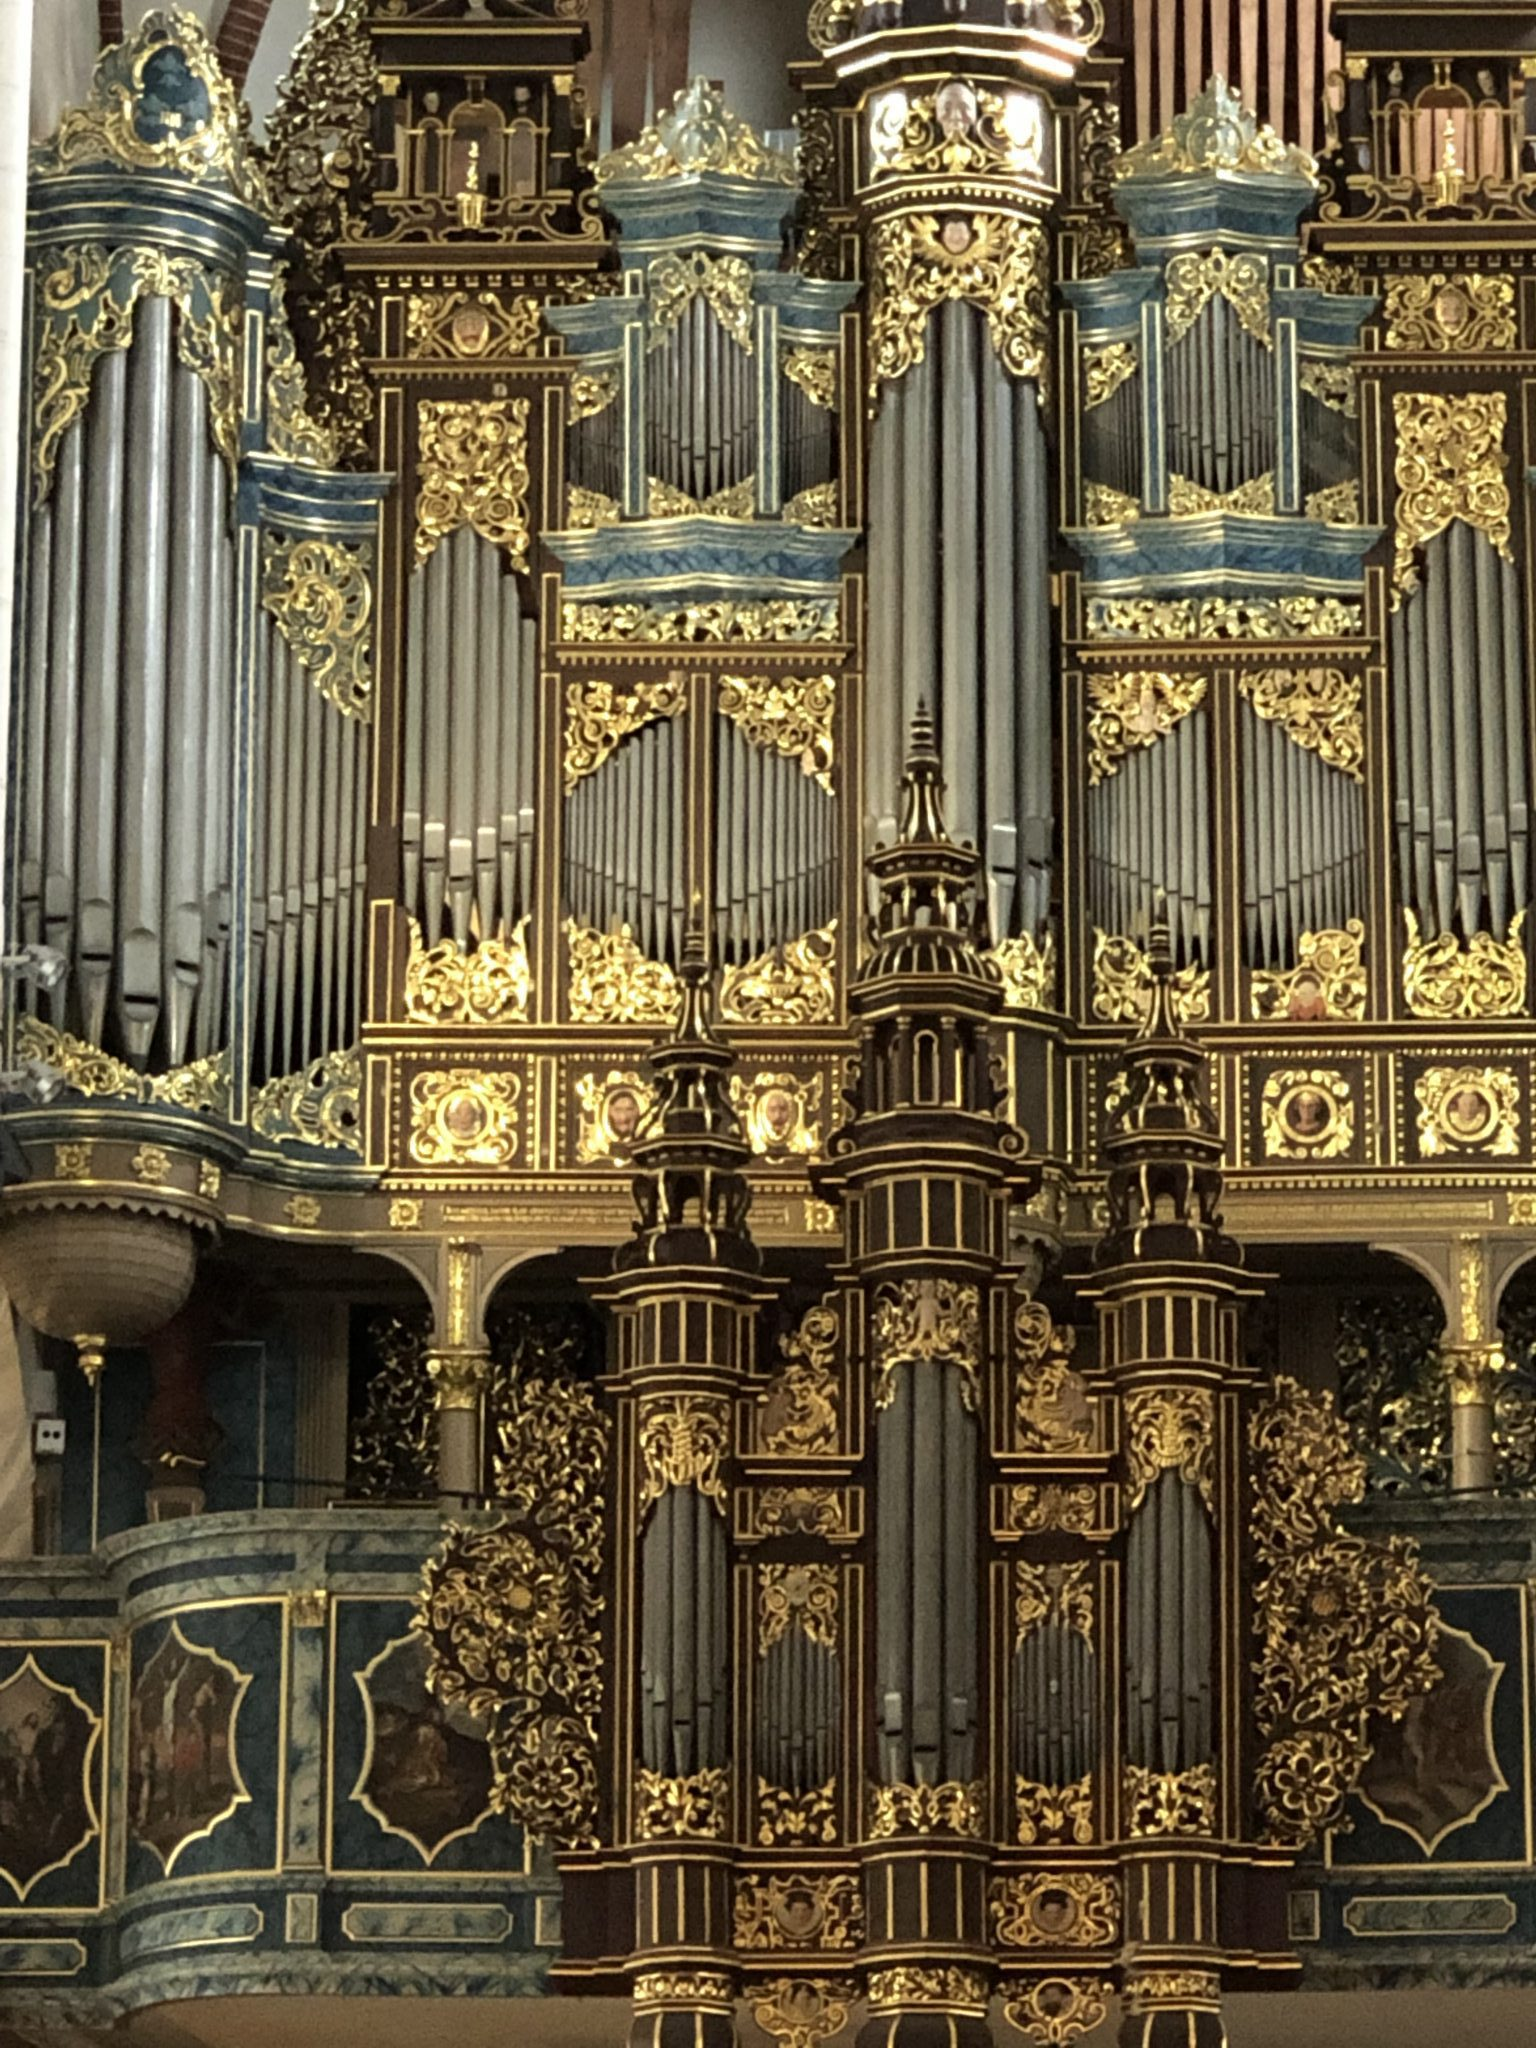 Die goldene Orgel im Dom in Riga